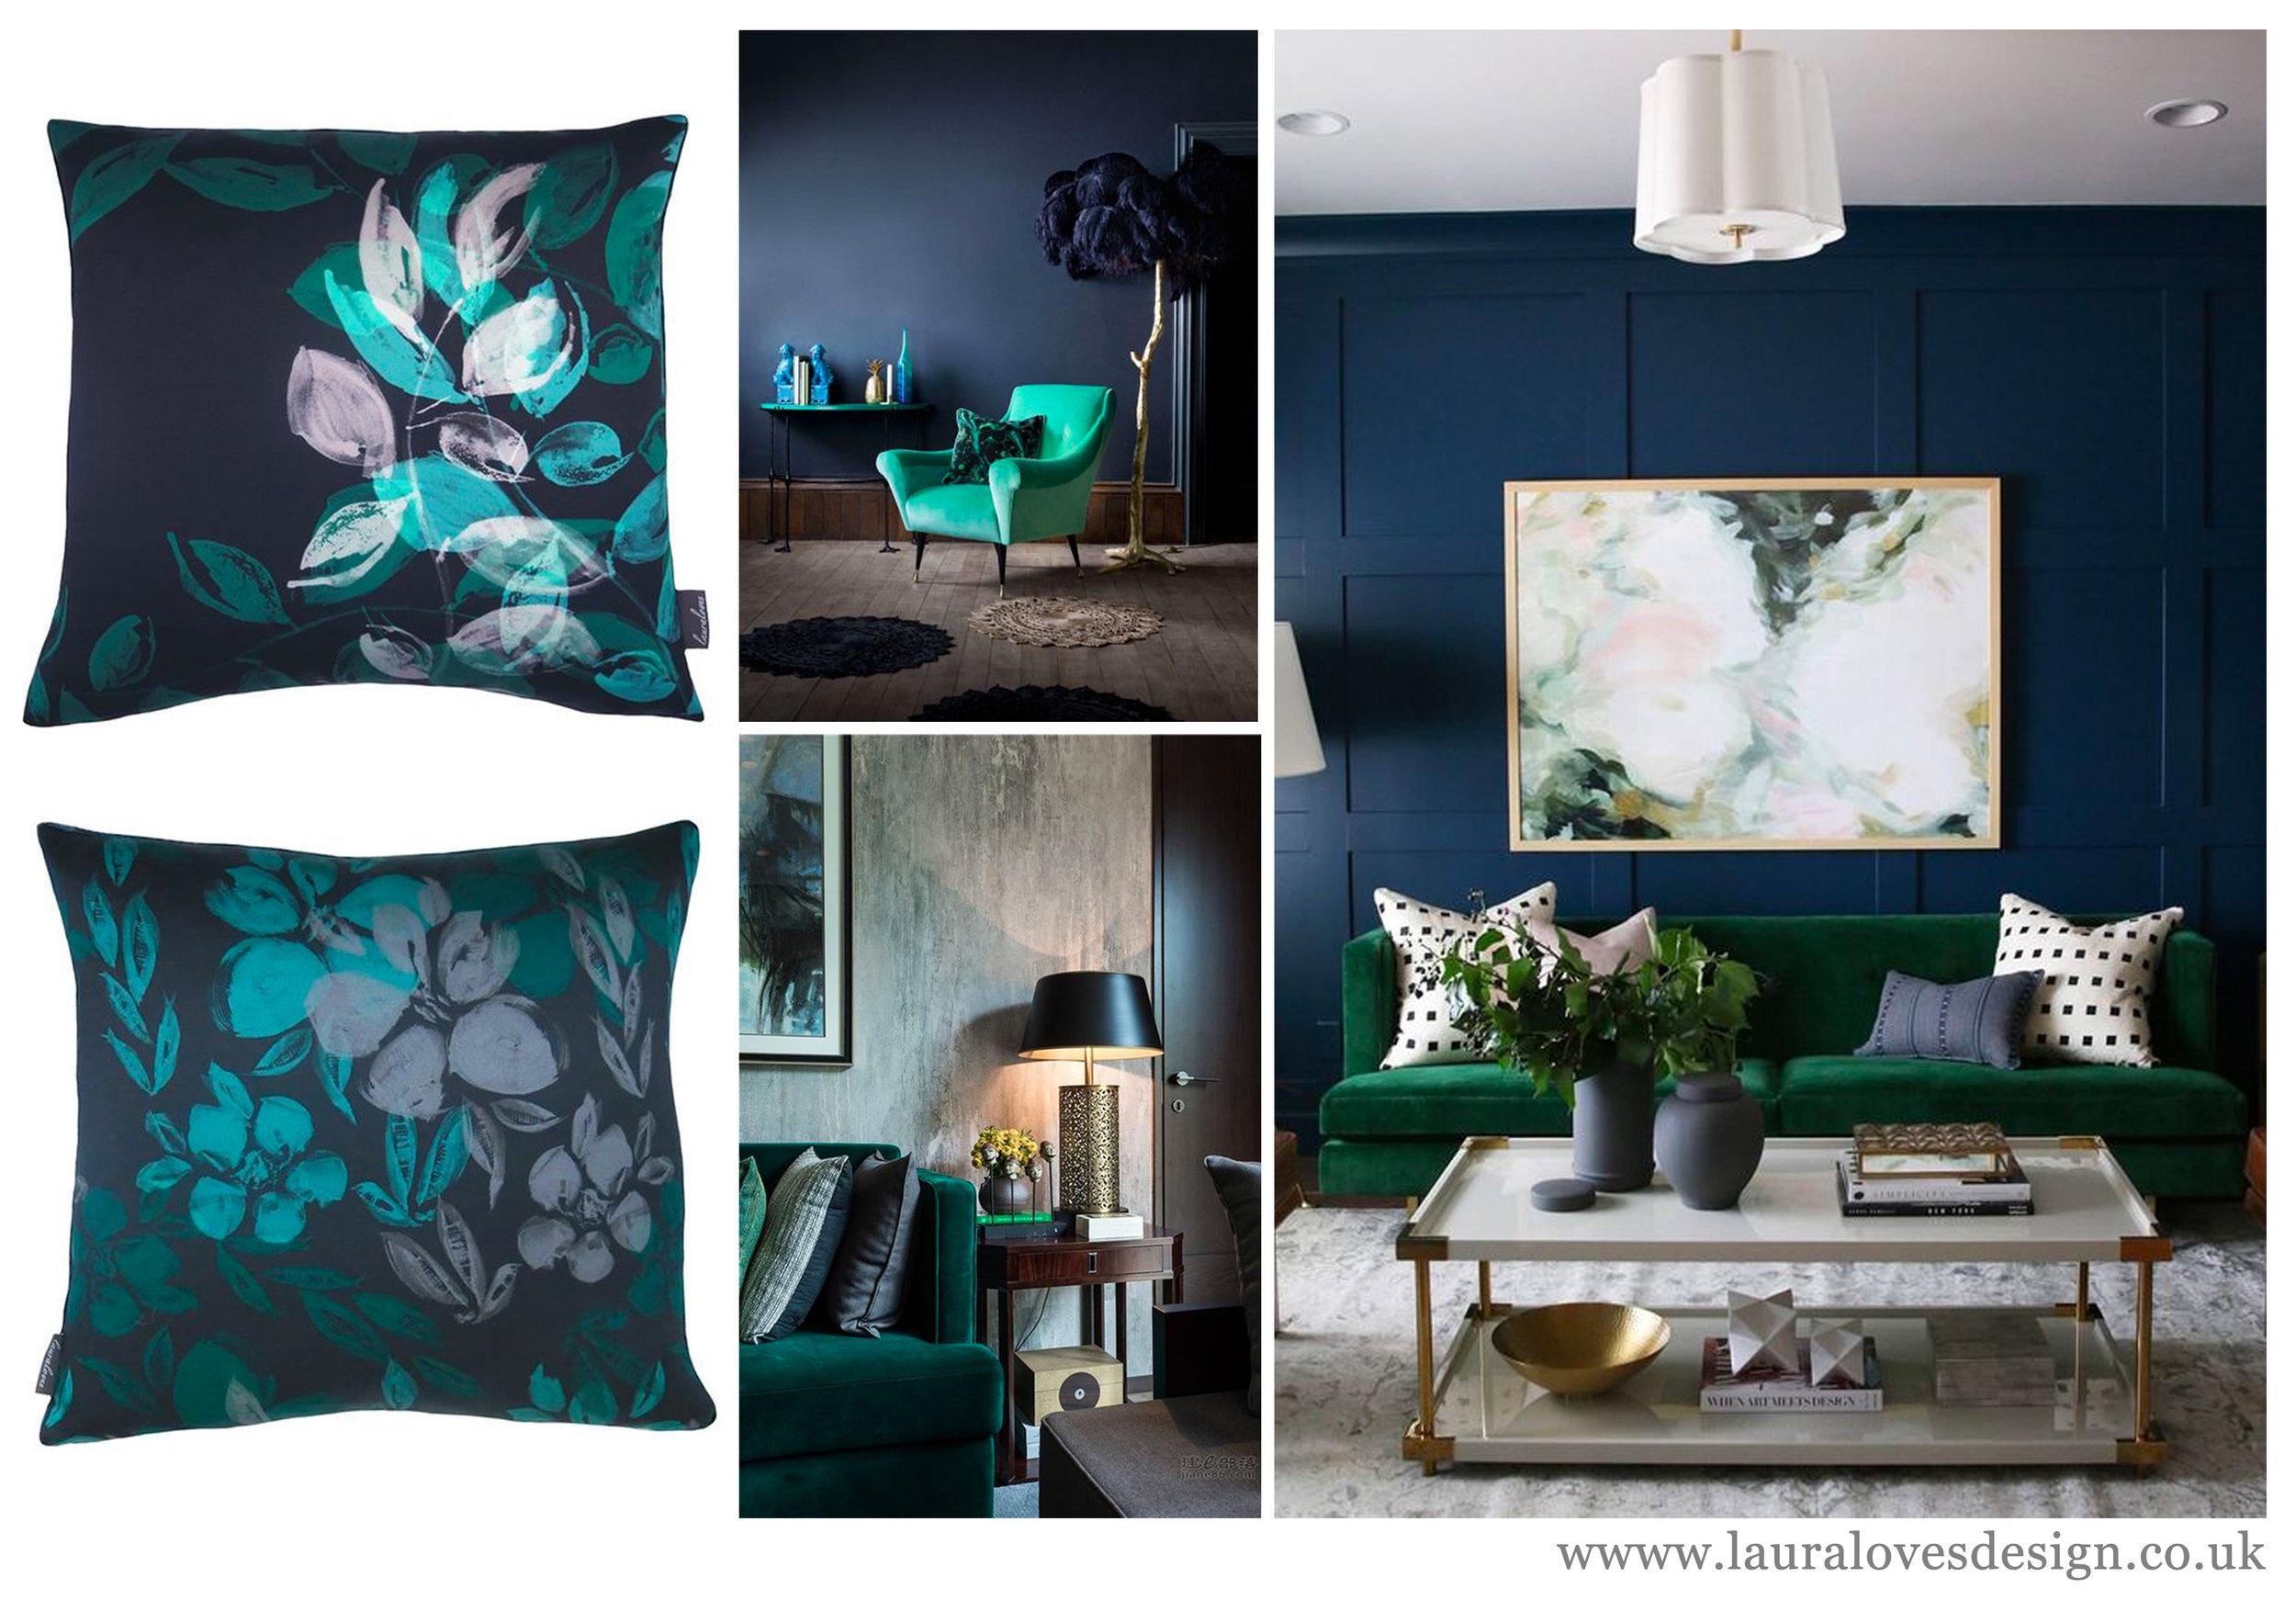 Blue-Green-Interiors-Colour-2018-Lauraloives-Evelyn-Cushions-designed-by-Lauraloves-design.jpg